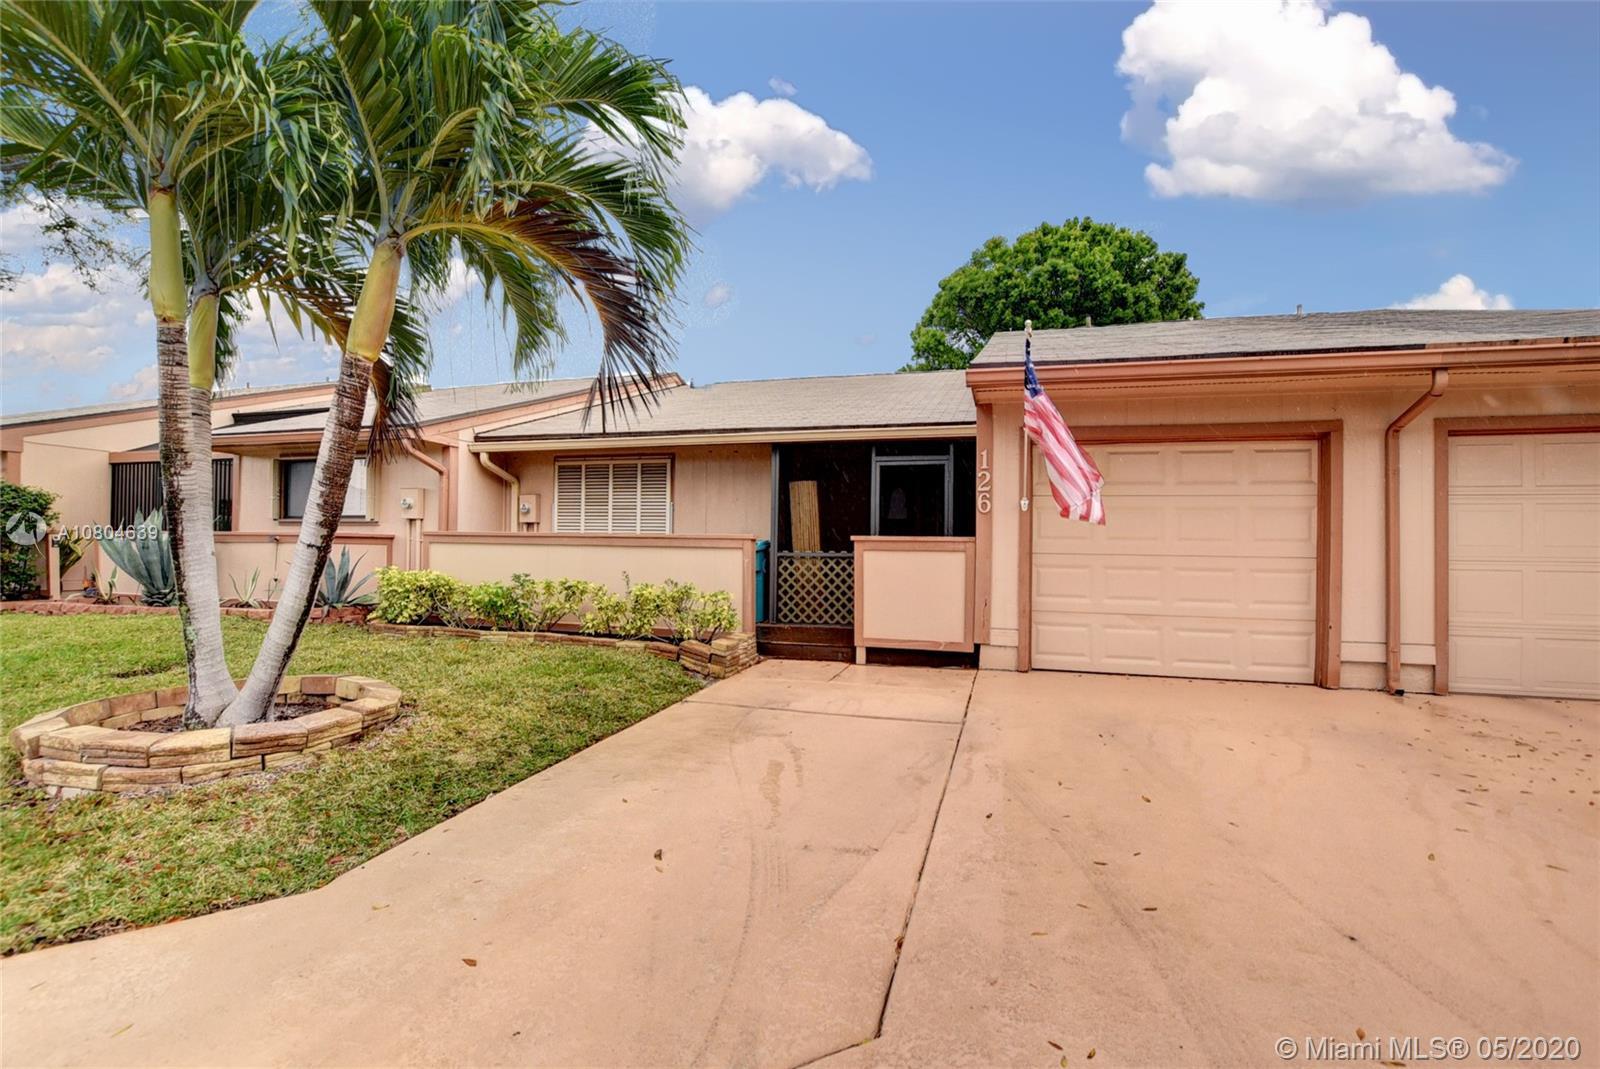 126 Mayfair Ln, Boynton Beach, FL 33426 - Boynton Beach, FL real estate listing